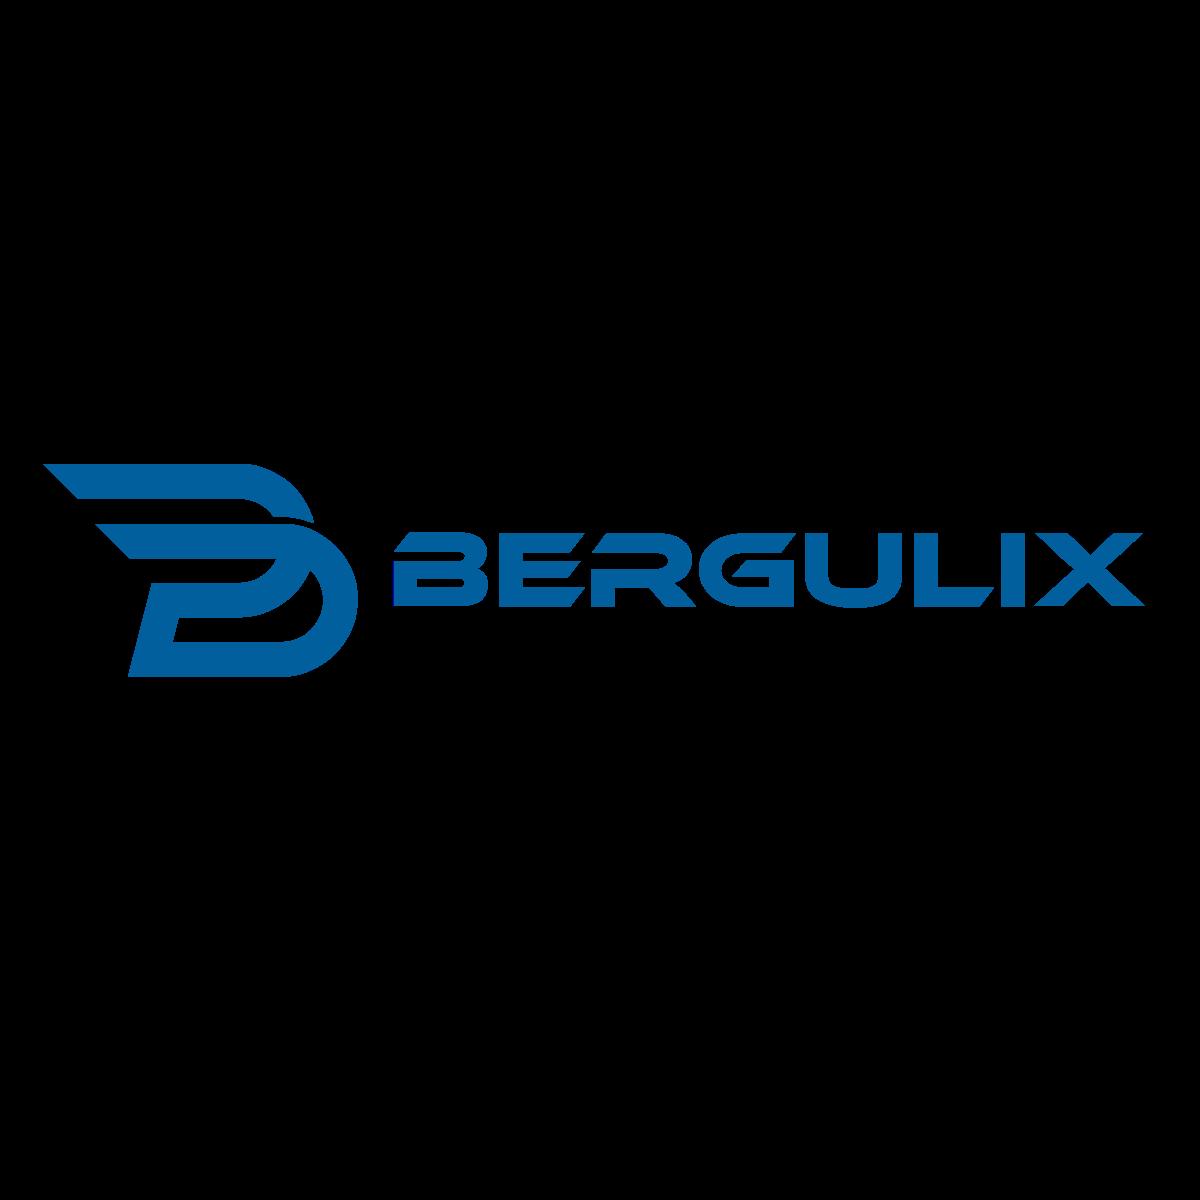 Bergulix, főkép